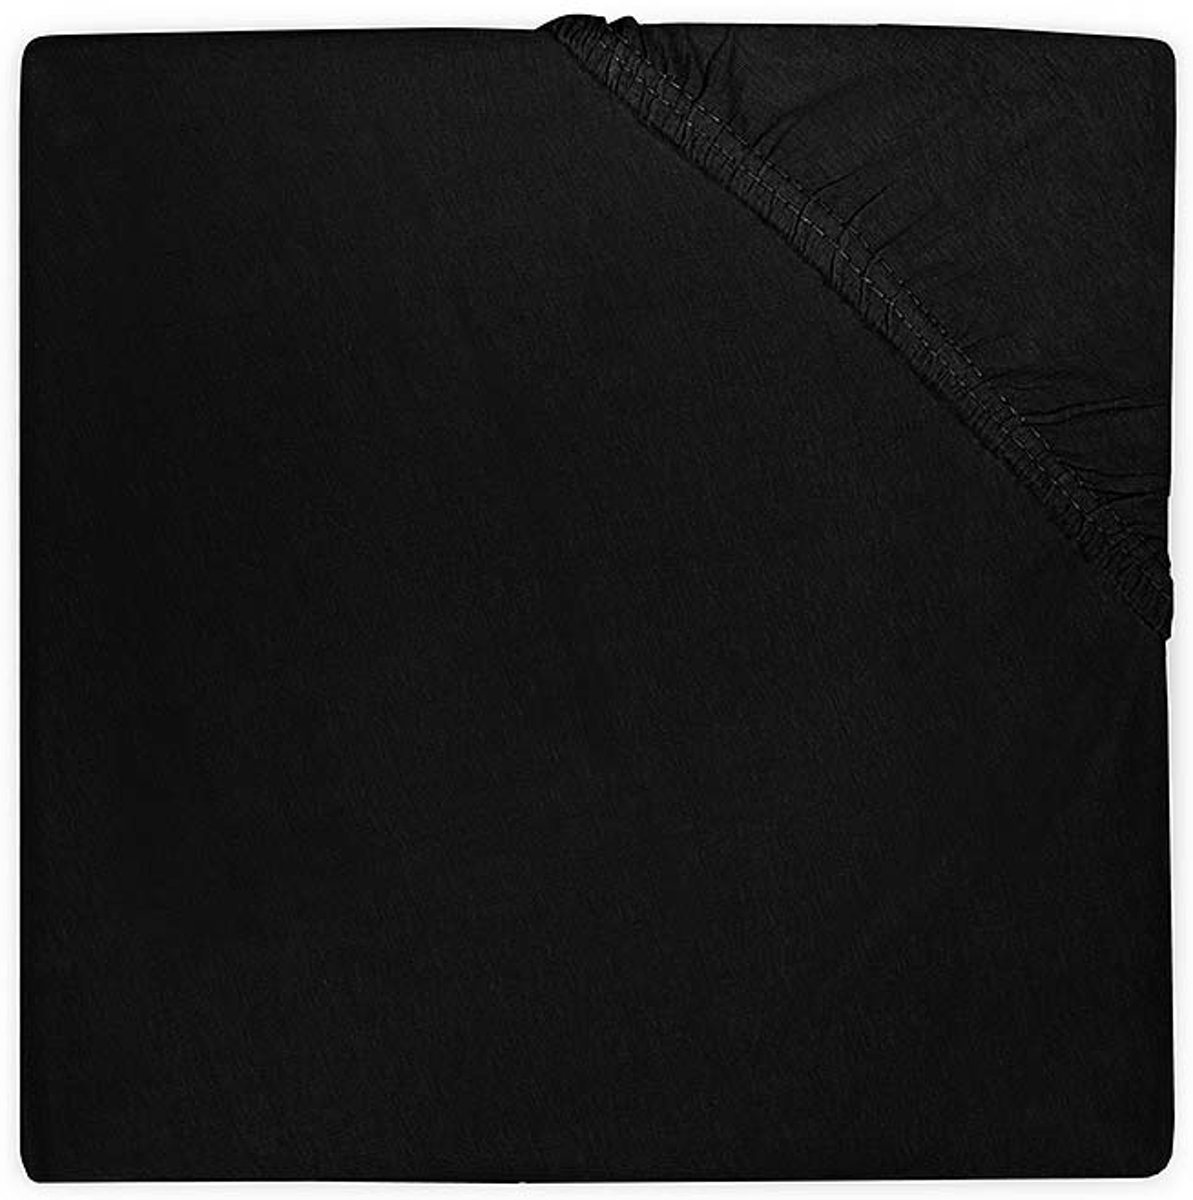 Jollein - Ledikant Hoeslaken Jersey - 60x120 cm - Zwart